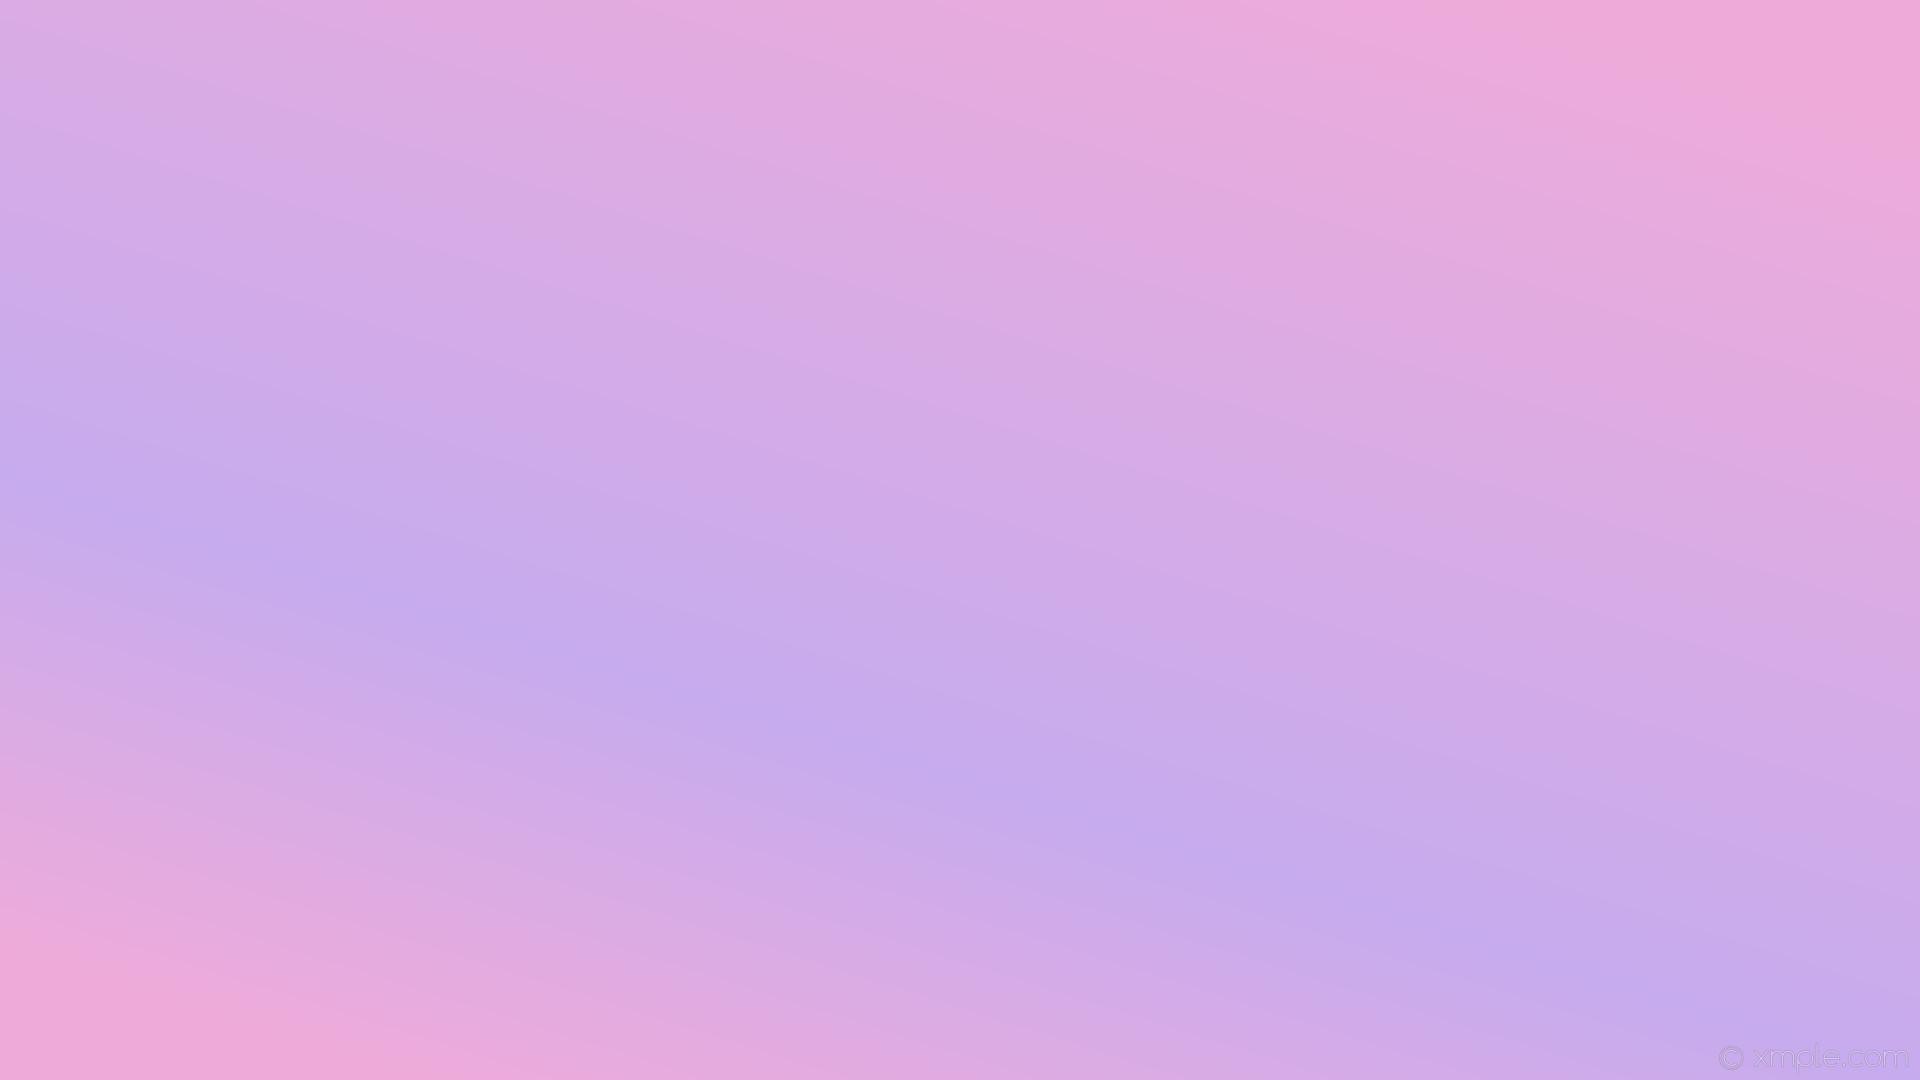 Light Purple Wallpaper (75+ Images